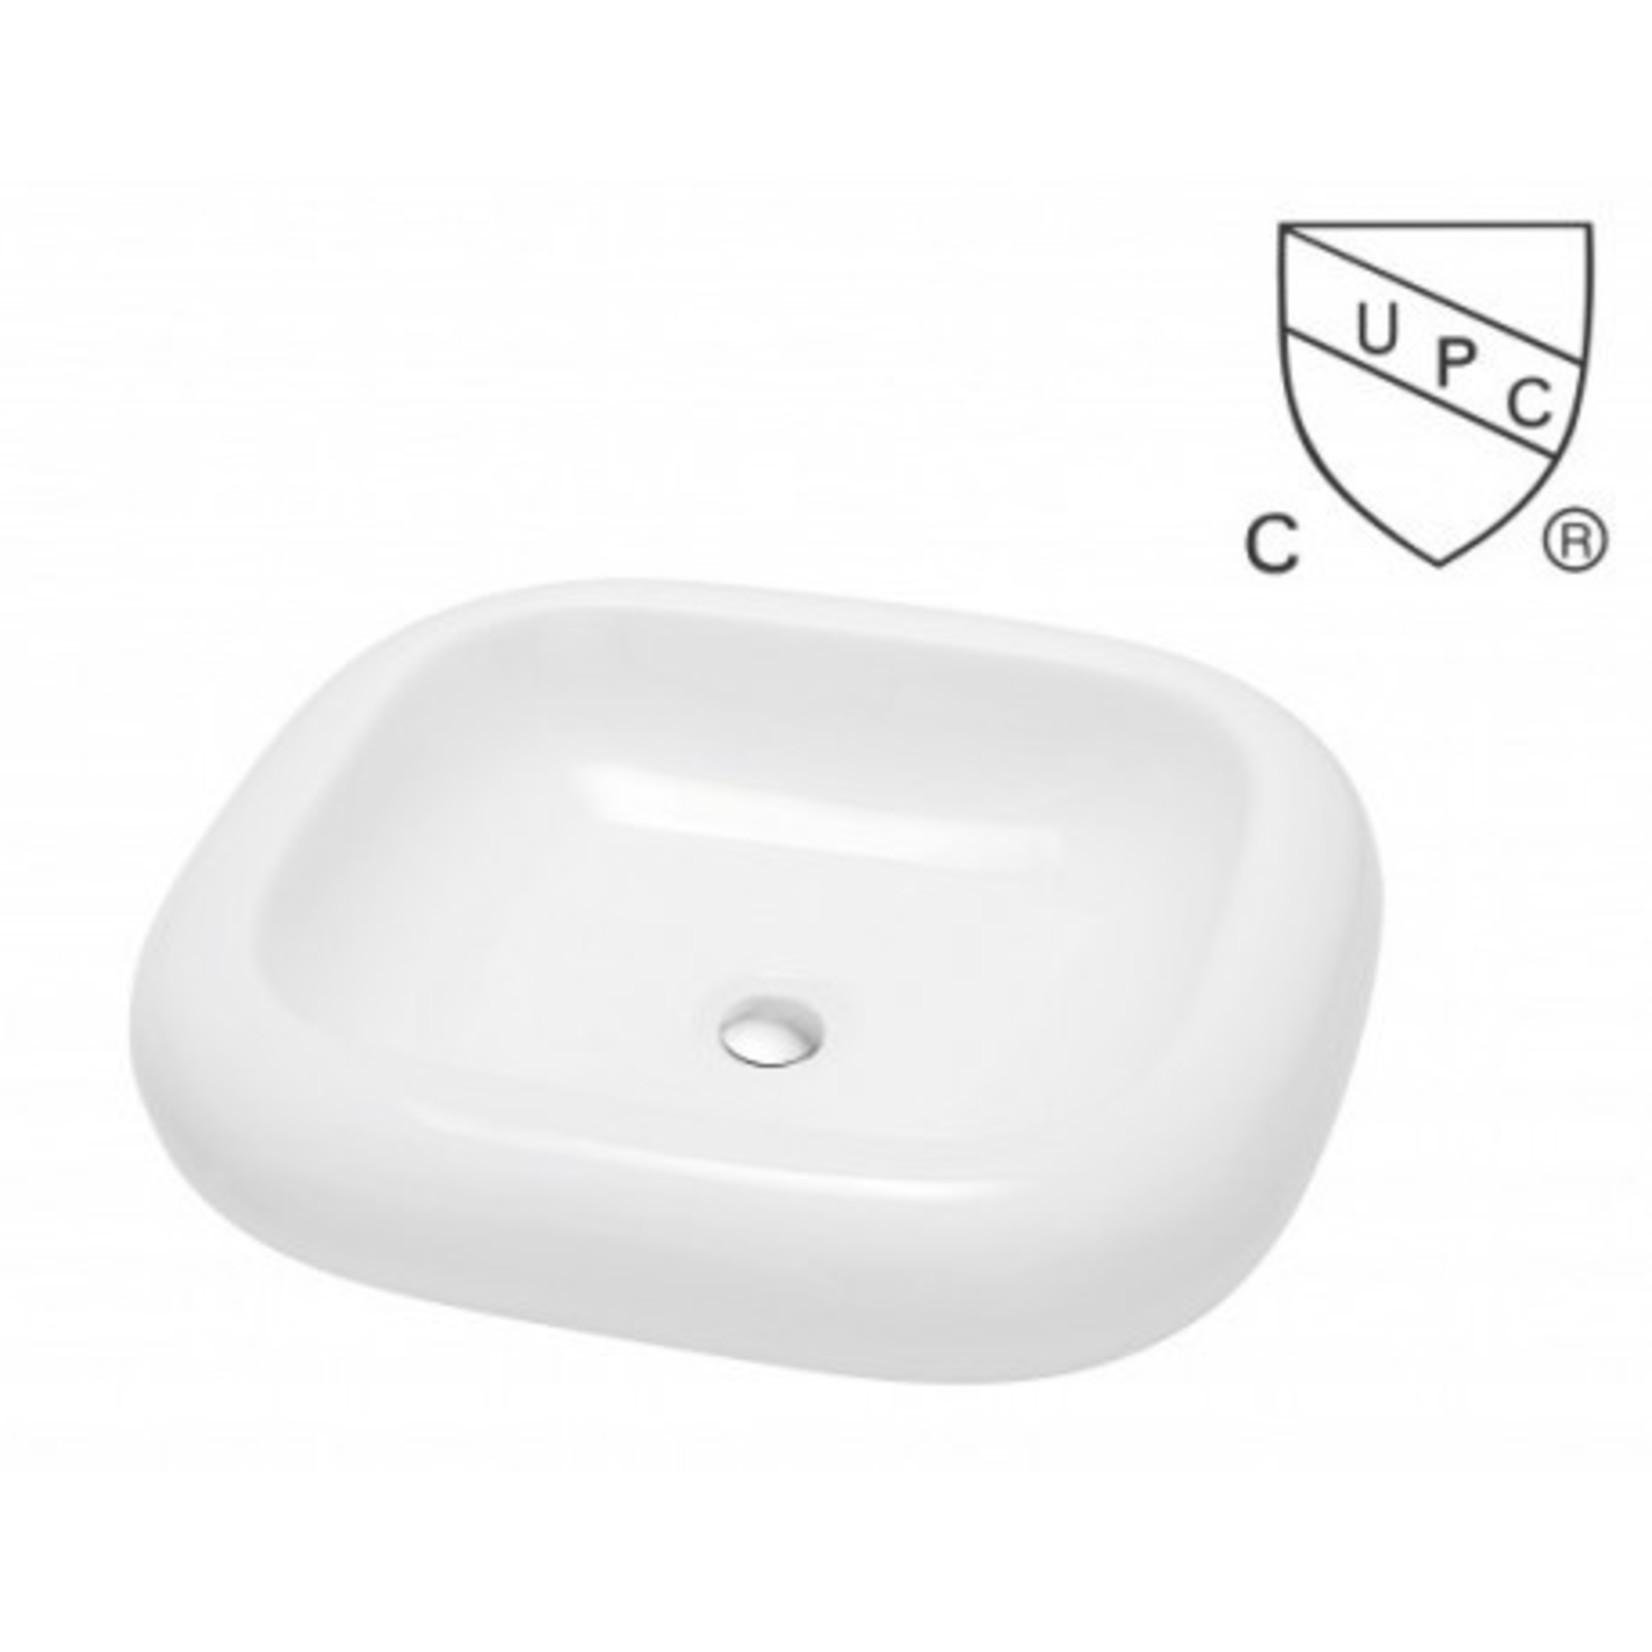 Porcelain washbasin S-800